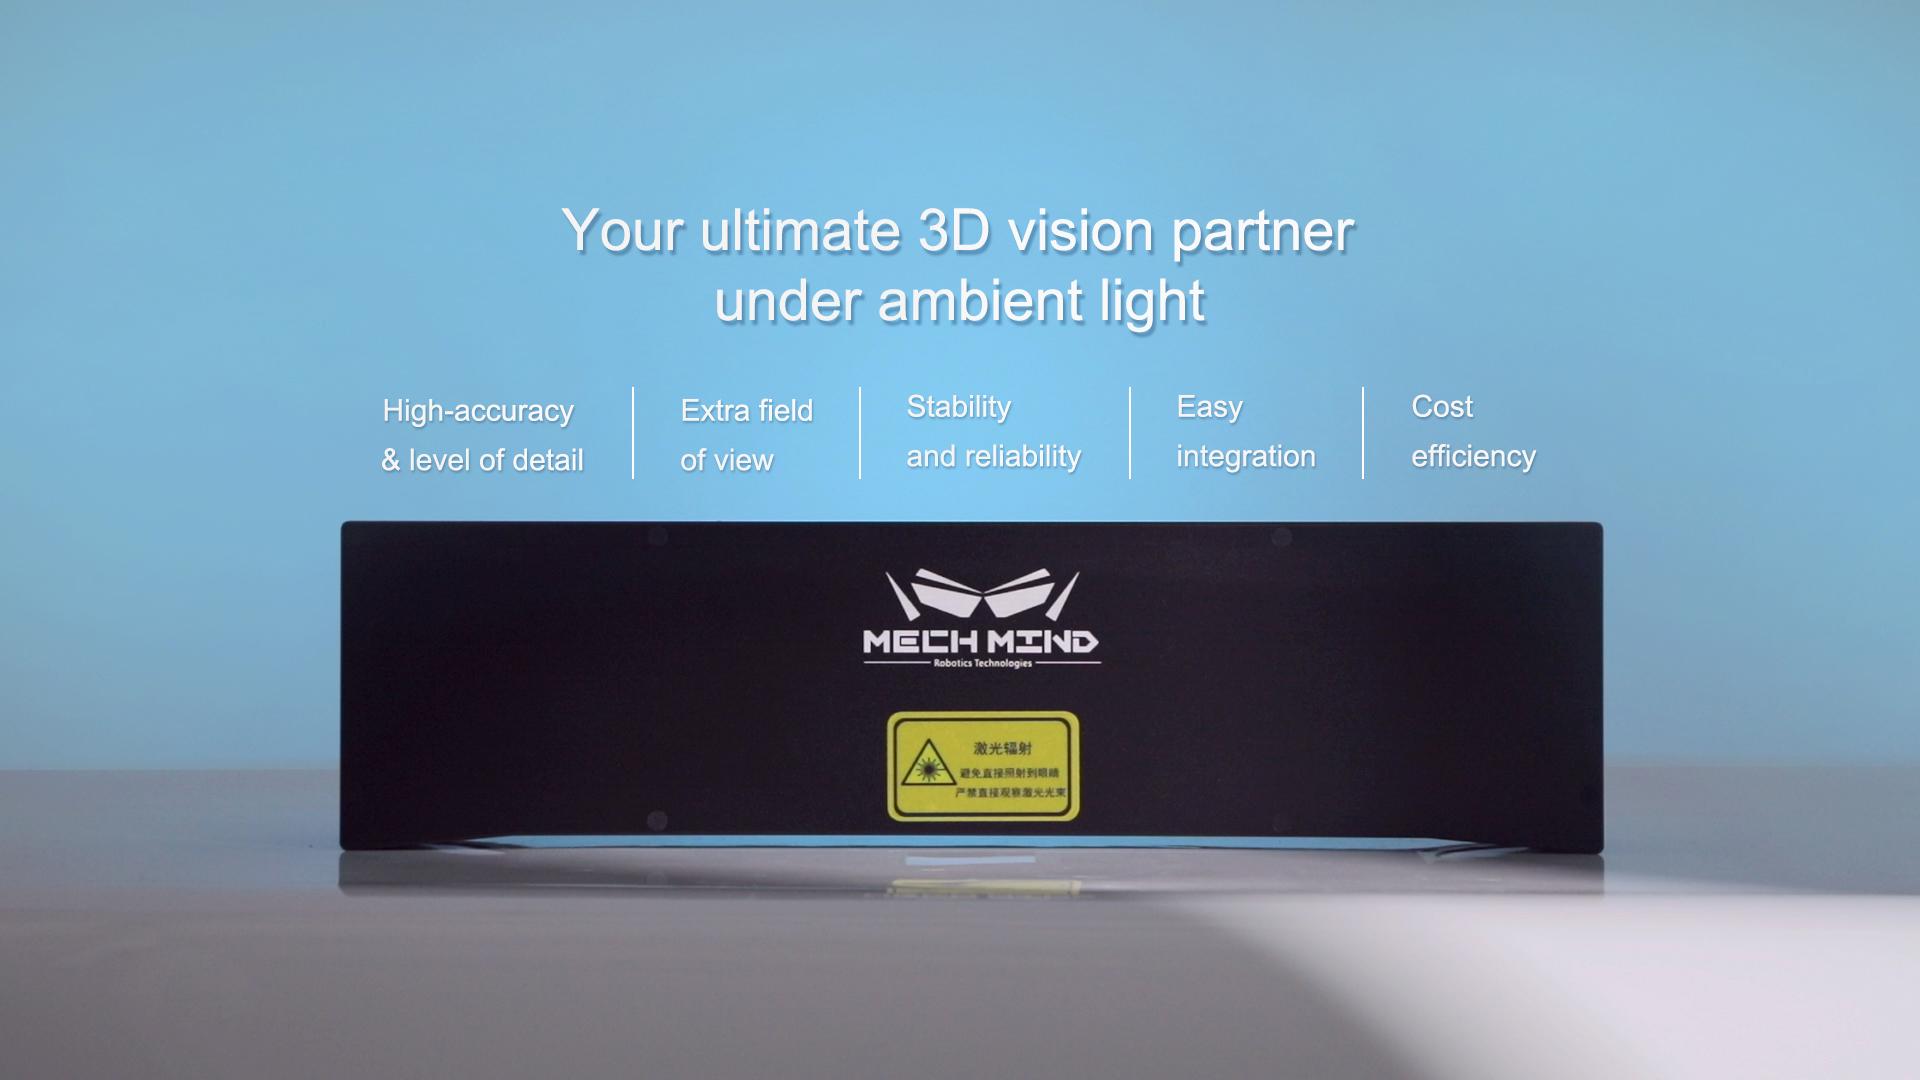 Release of New Generation of Mech-Eye Laser 3D Laser Camera